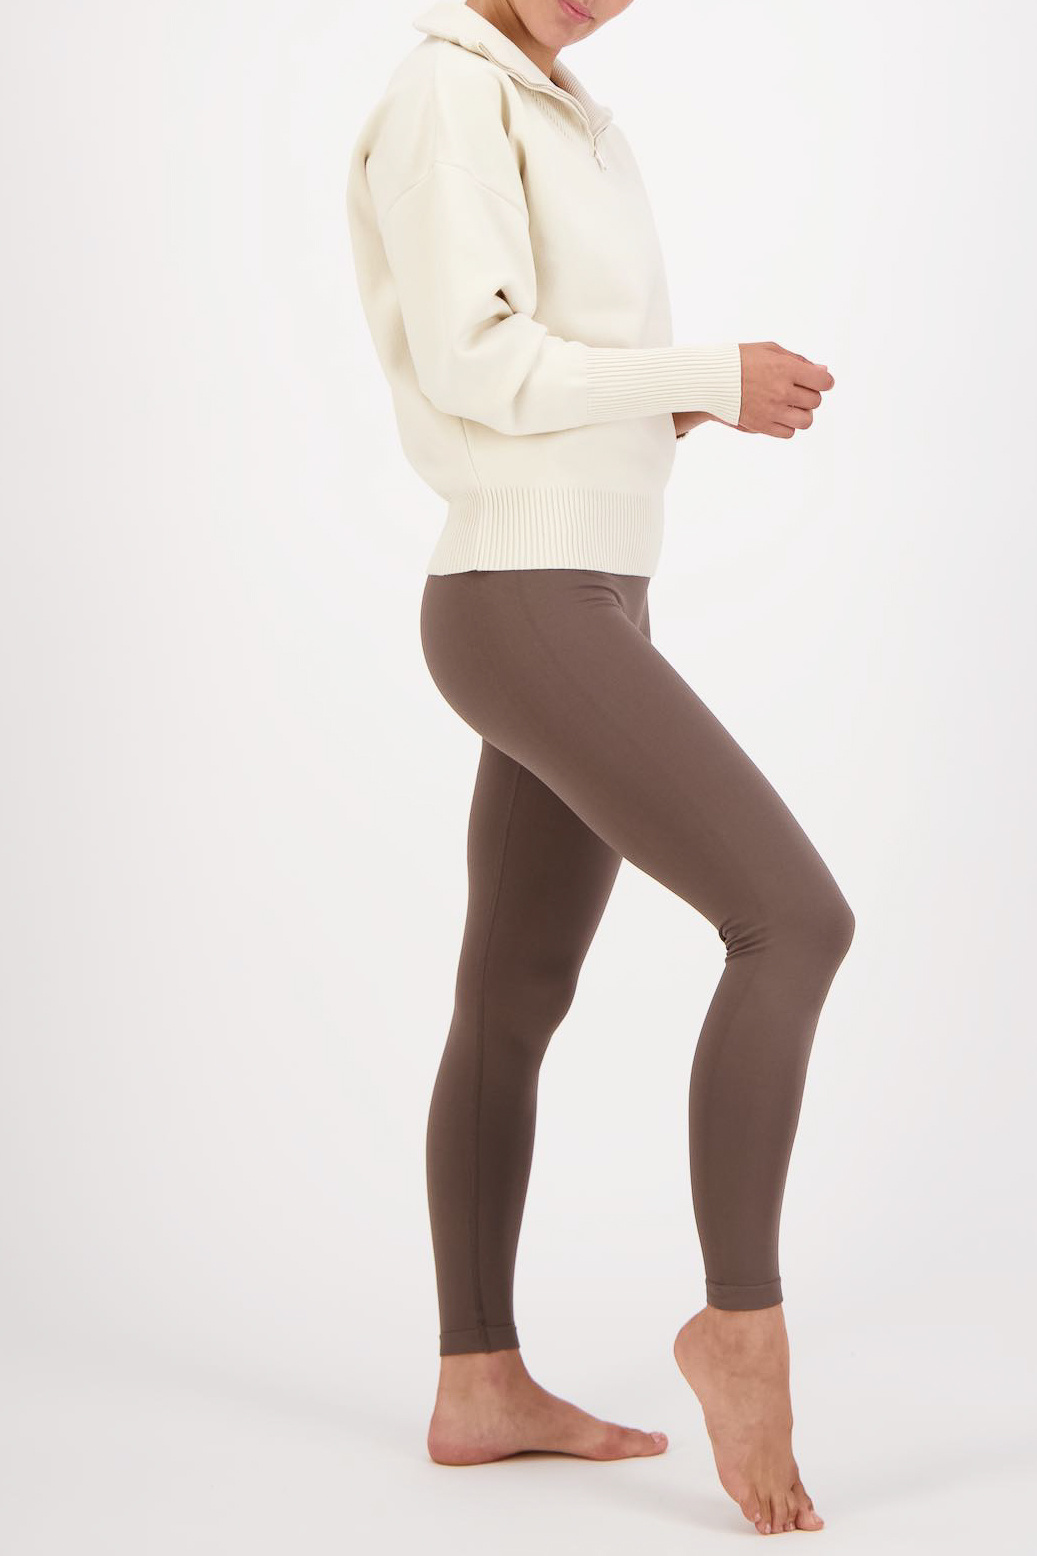 Olly Half-Zip Knit Sweater - Cream White-5